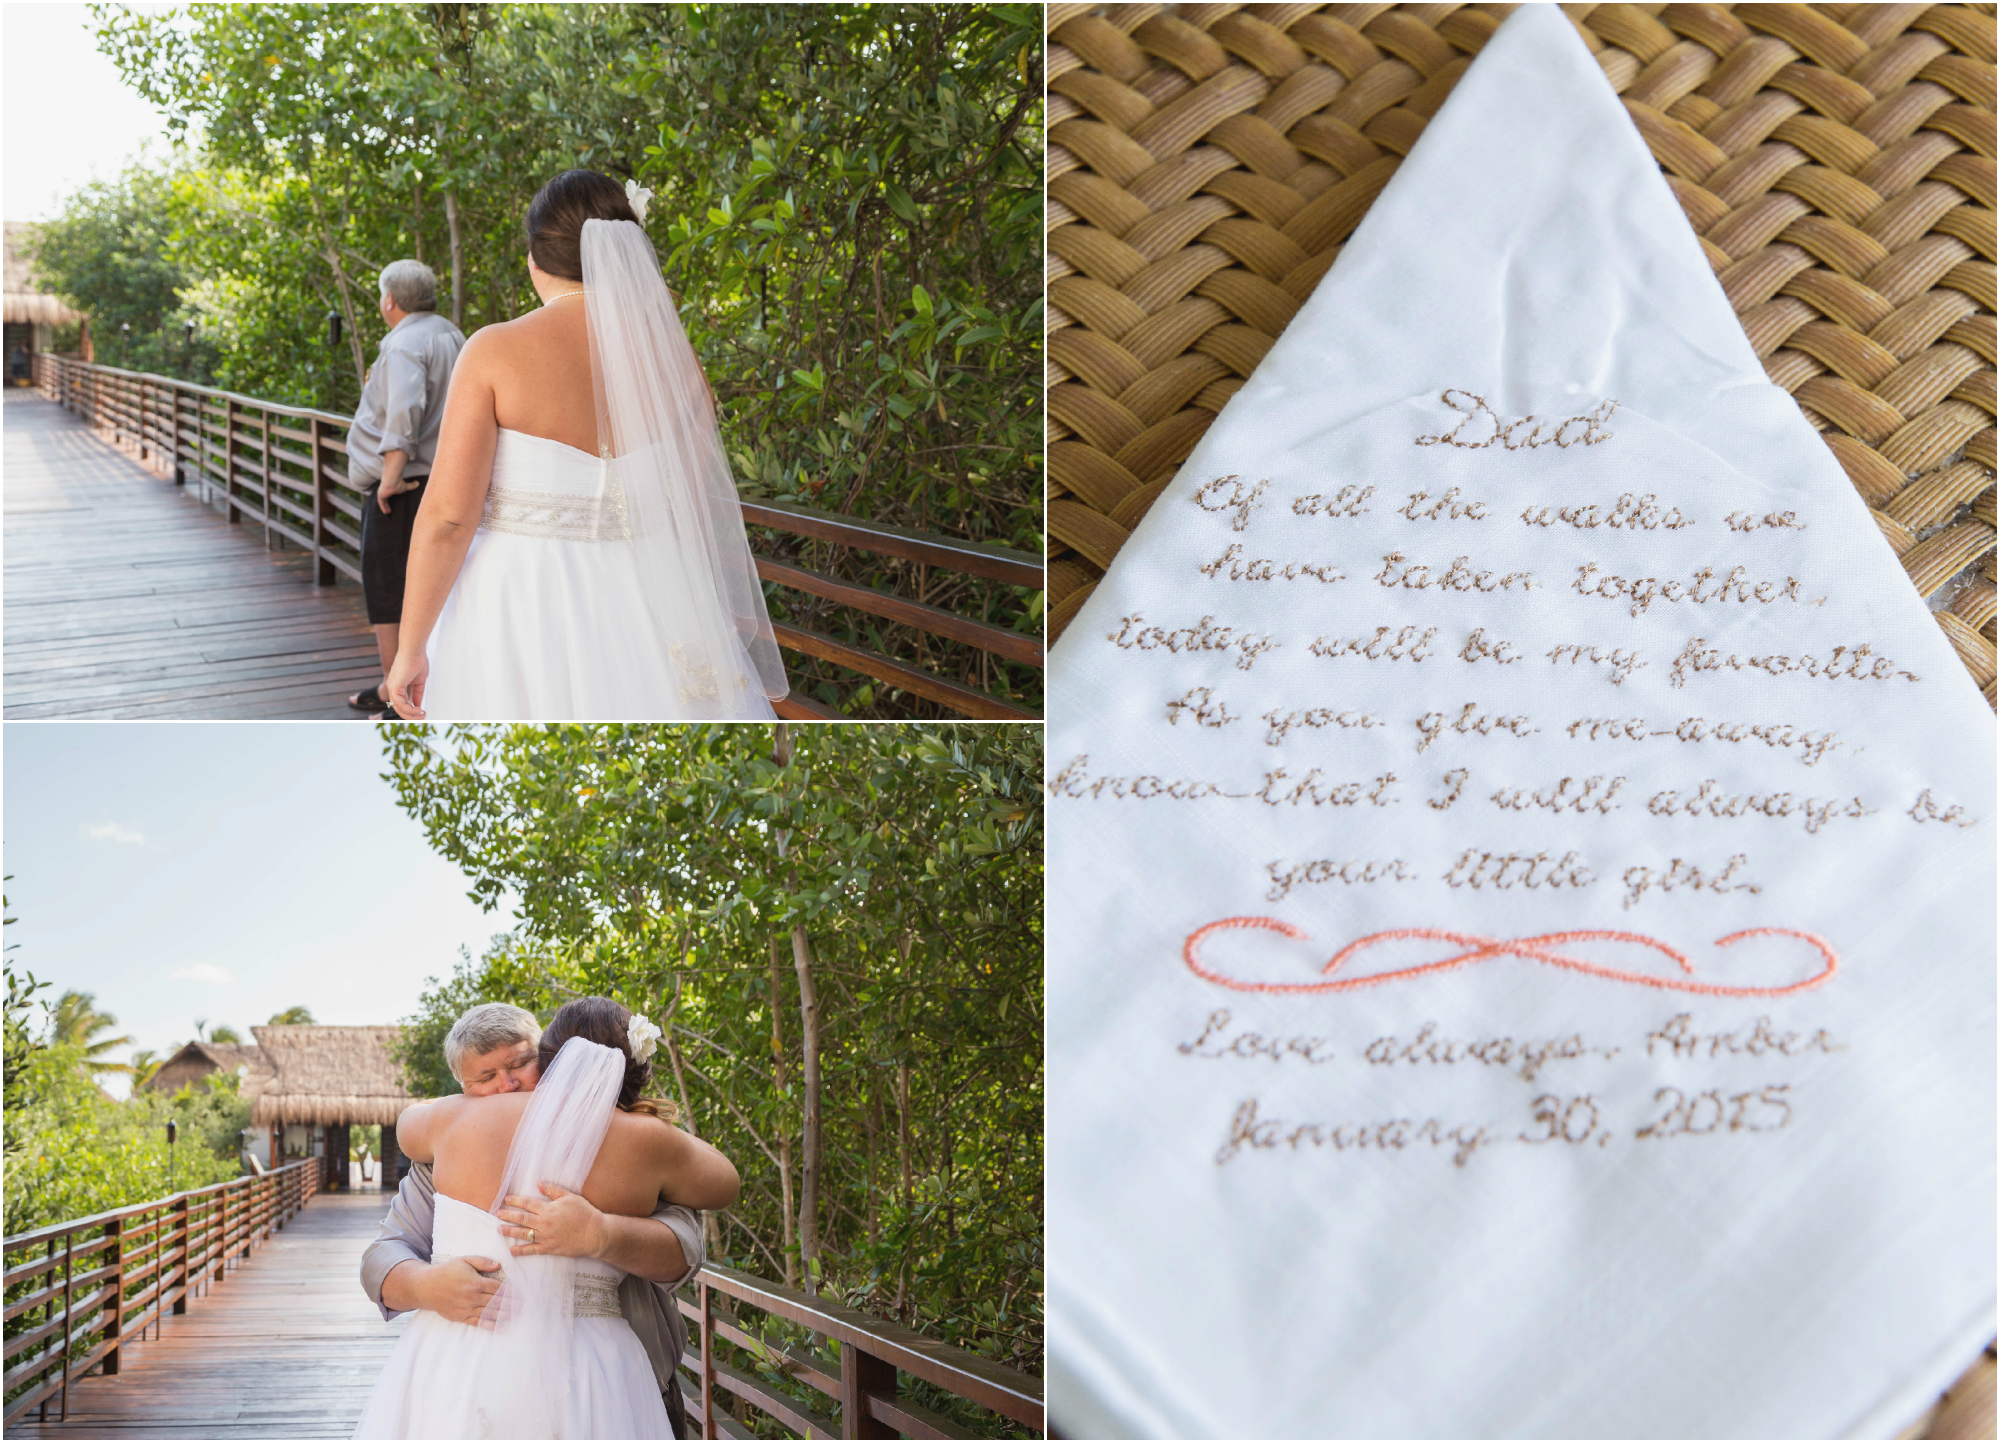 cancun_wedding12.png